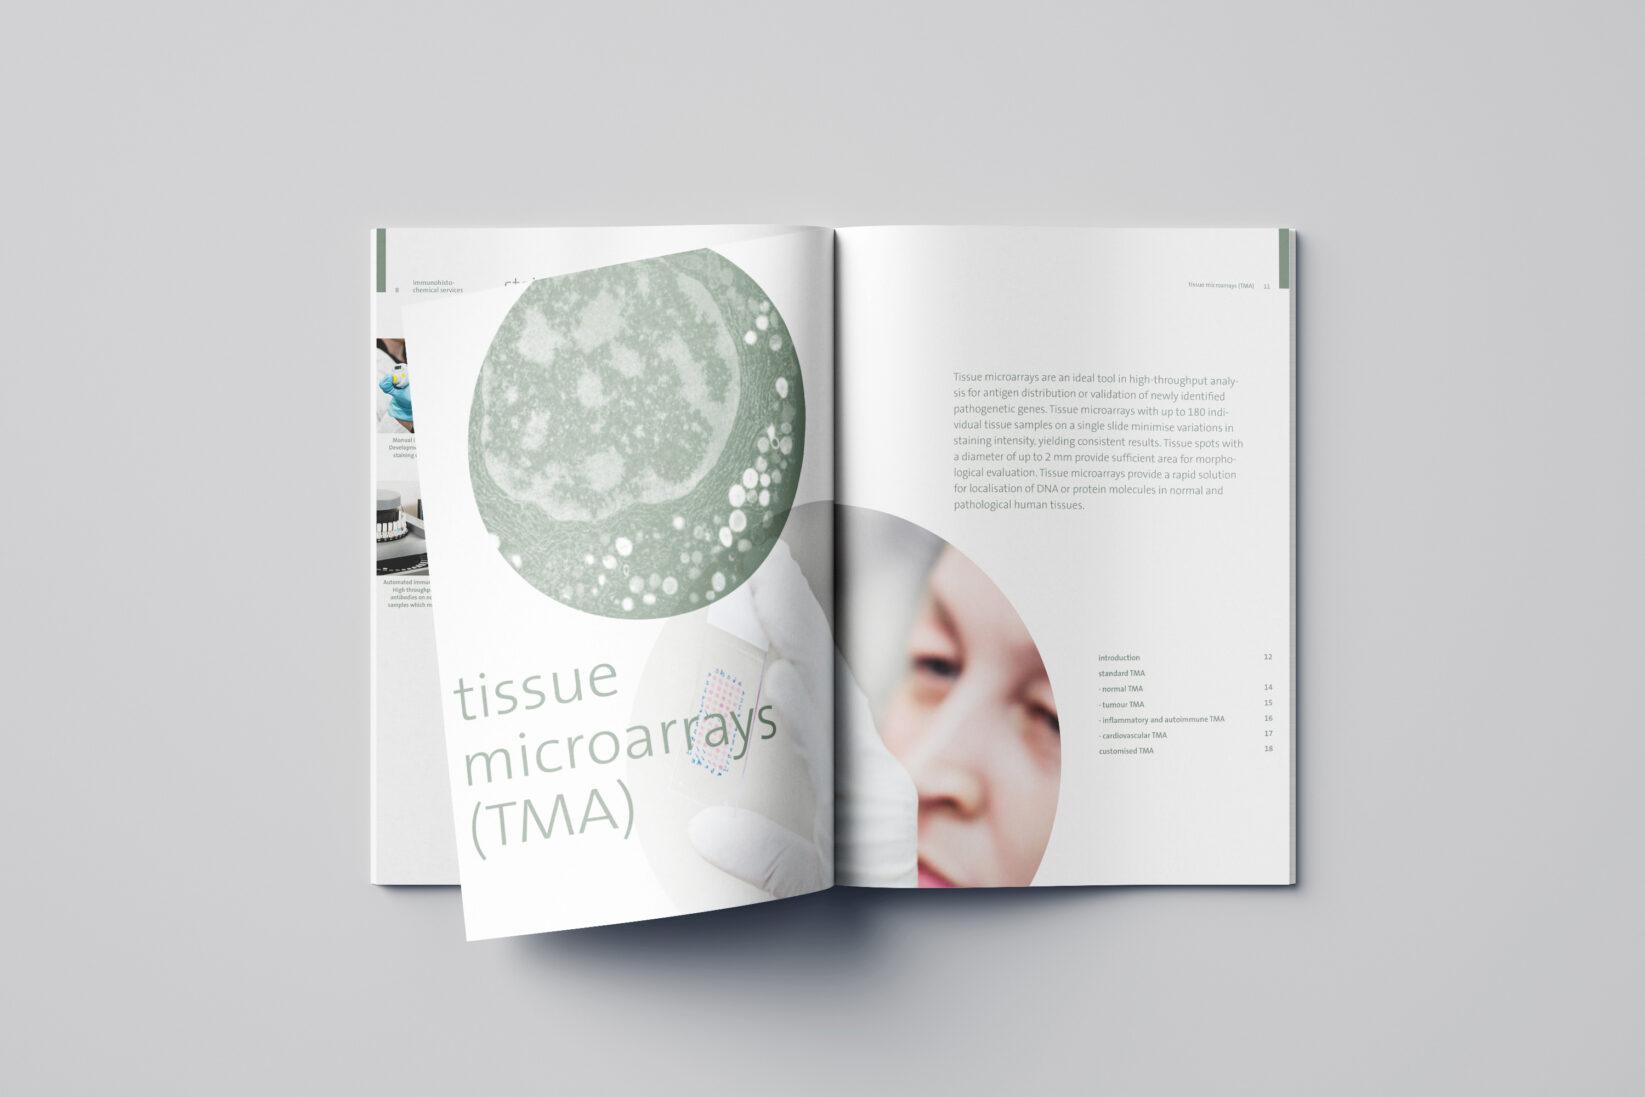 provitro Corporate Design Katalog Innenseite TMA